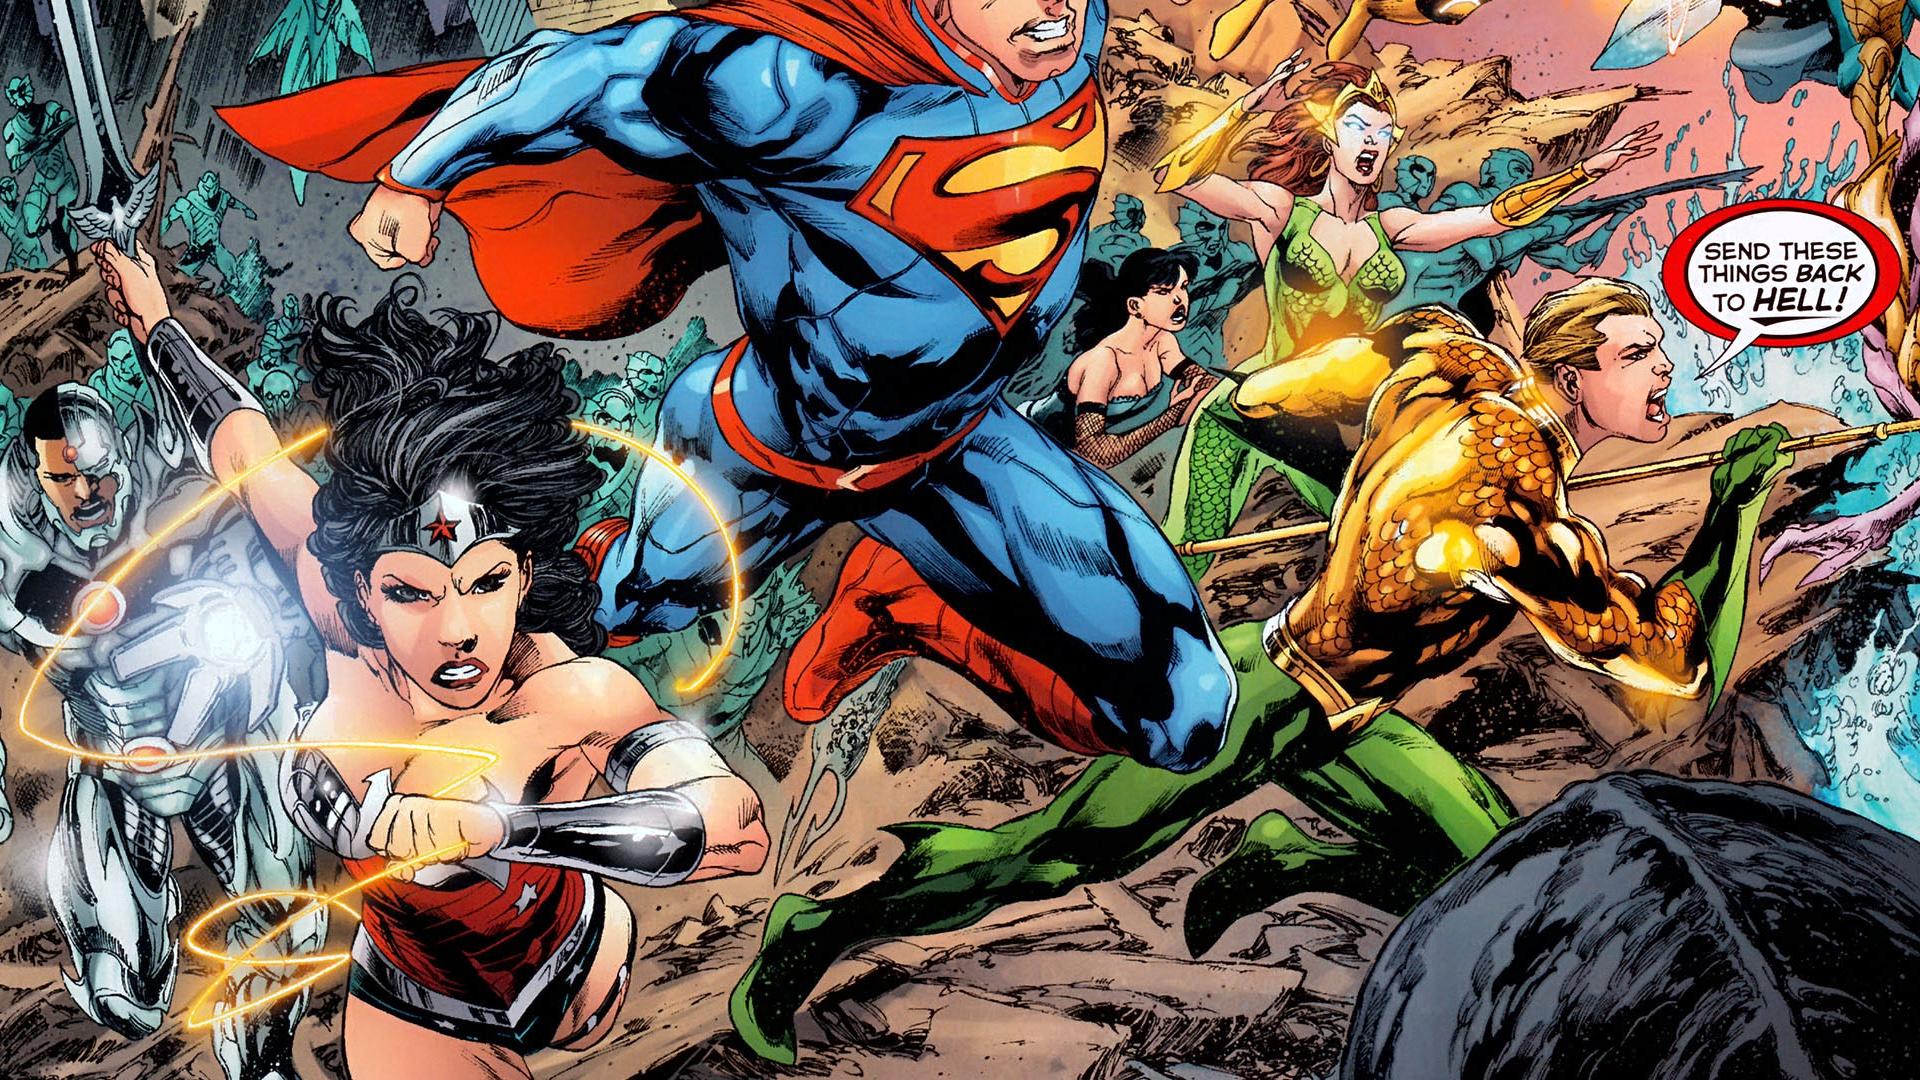 Superman New 52 Iphone Wallpaper Download